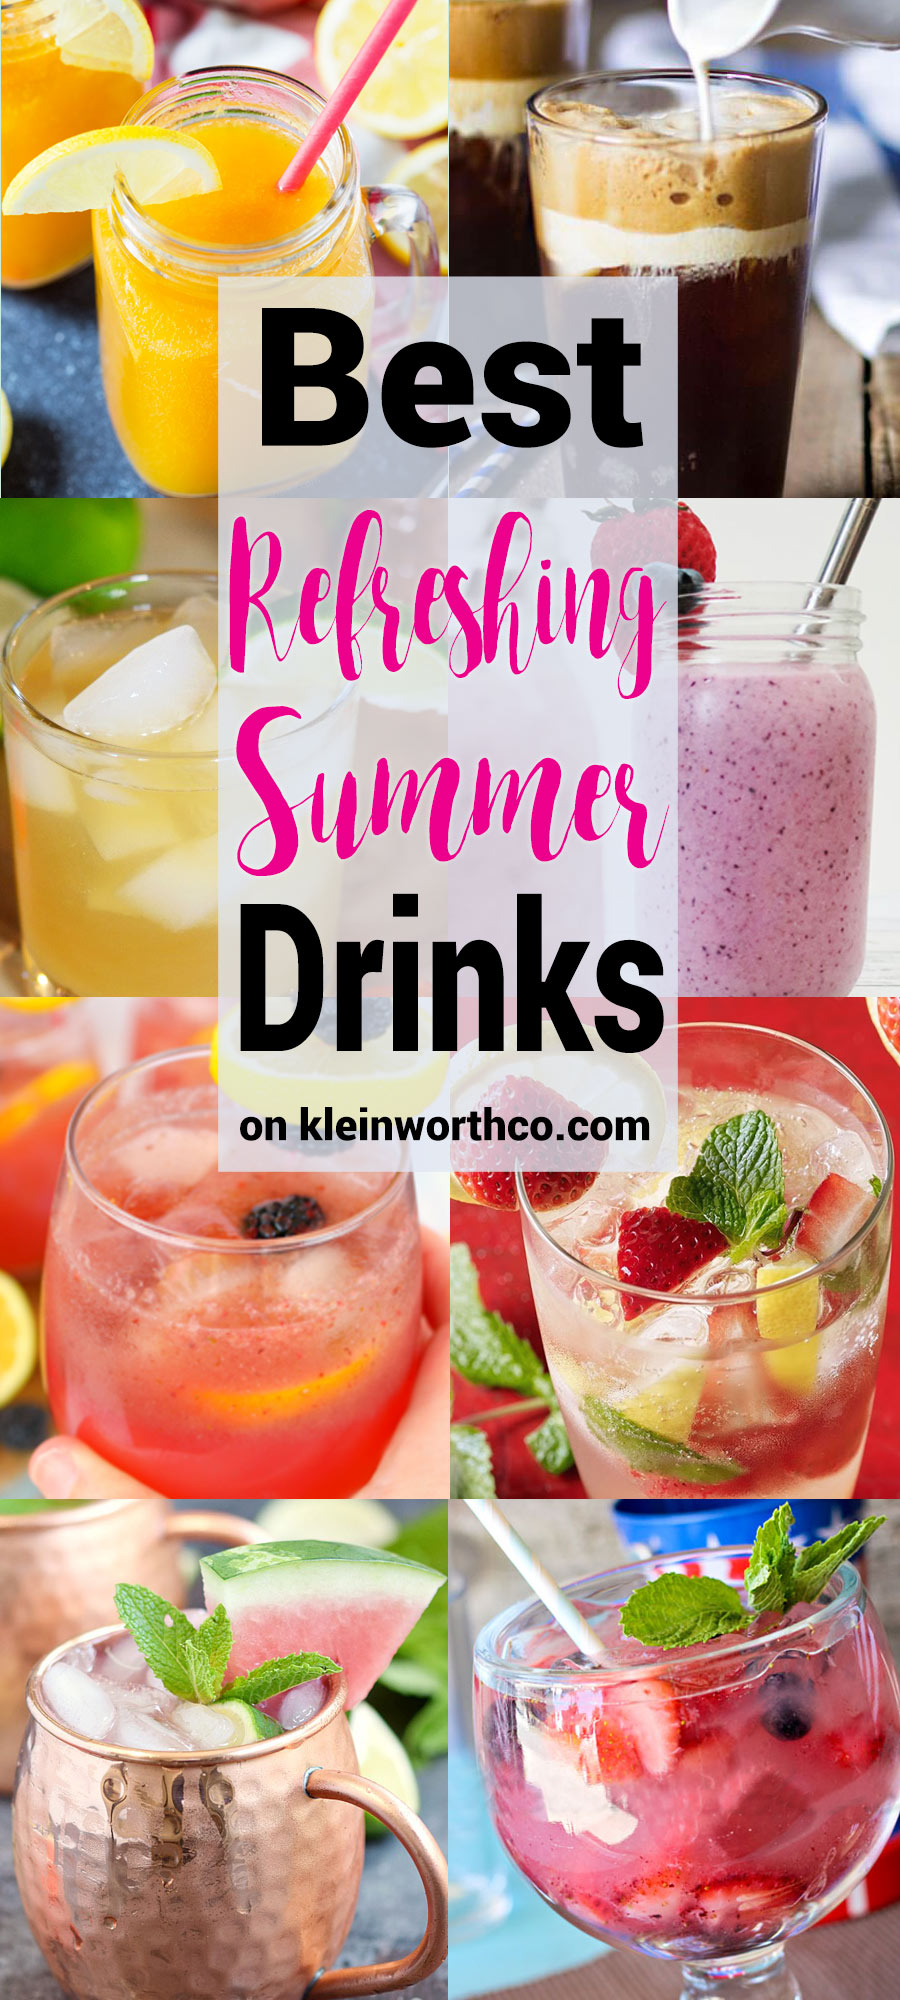 Best Refreshing Summer Drinks